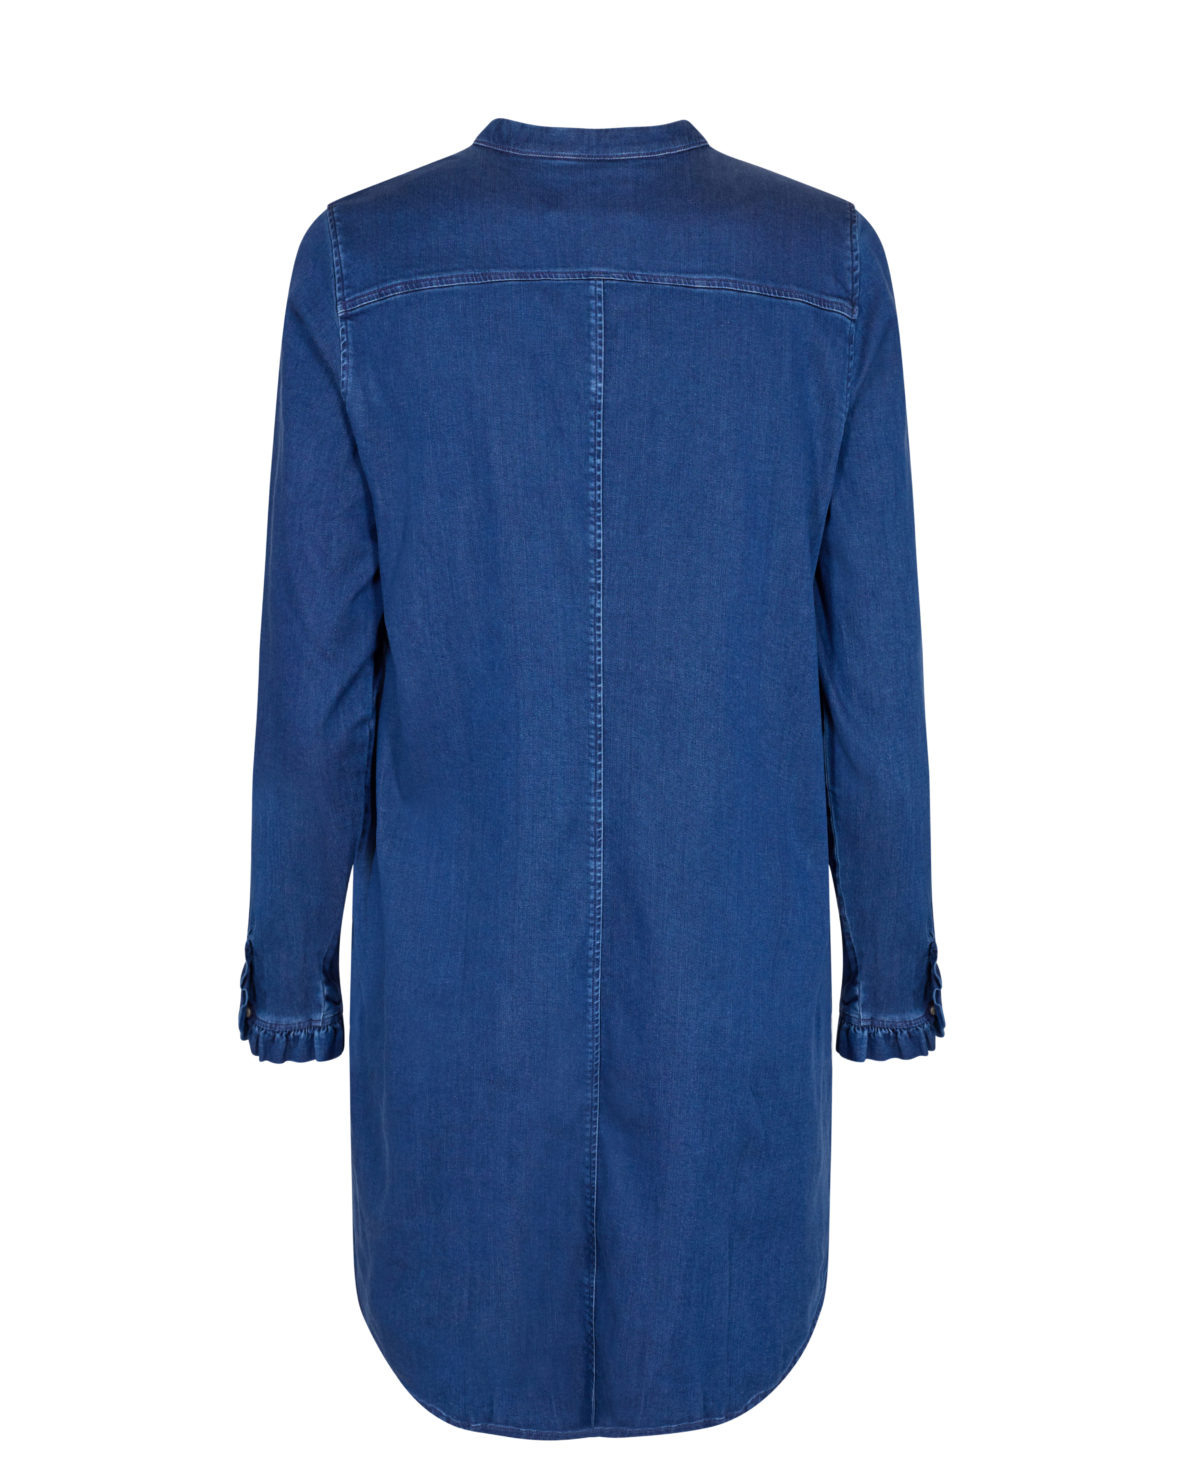 Mos Mosh  Mattie Denim Dress  Blue  Inside Living Shop